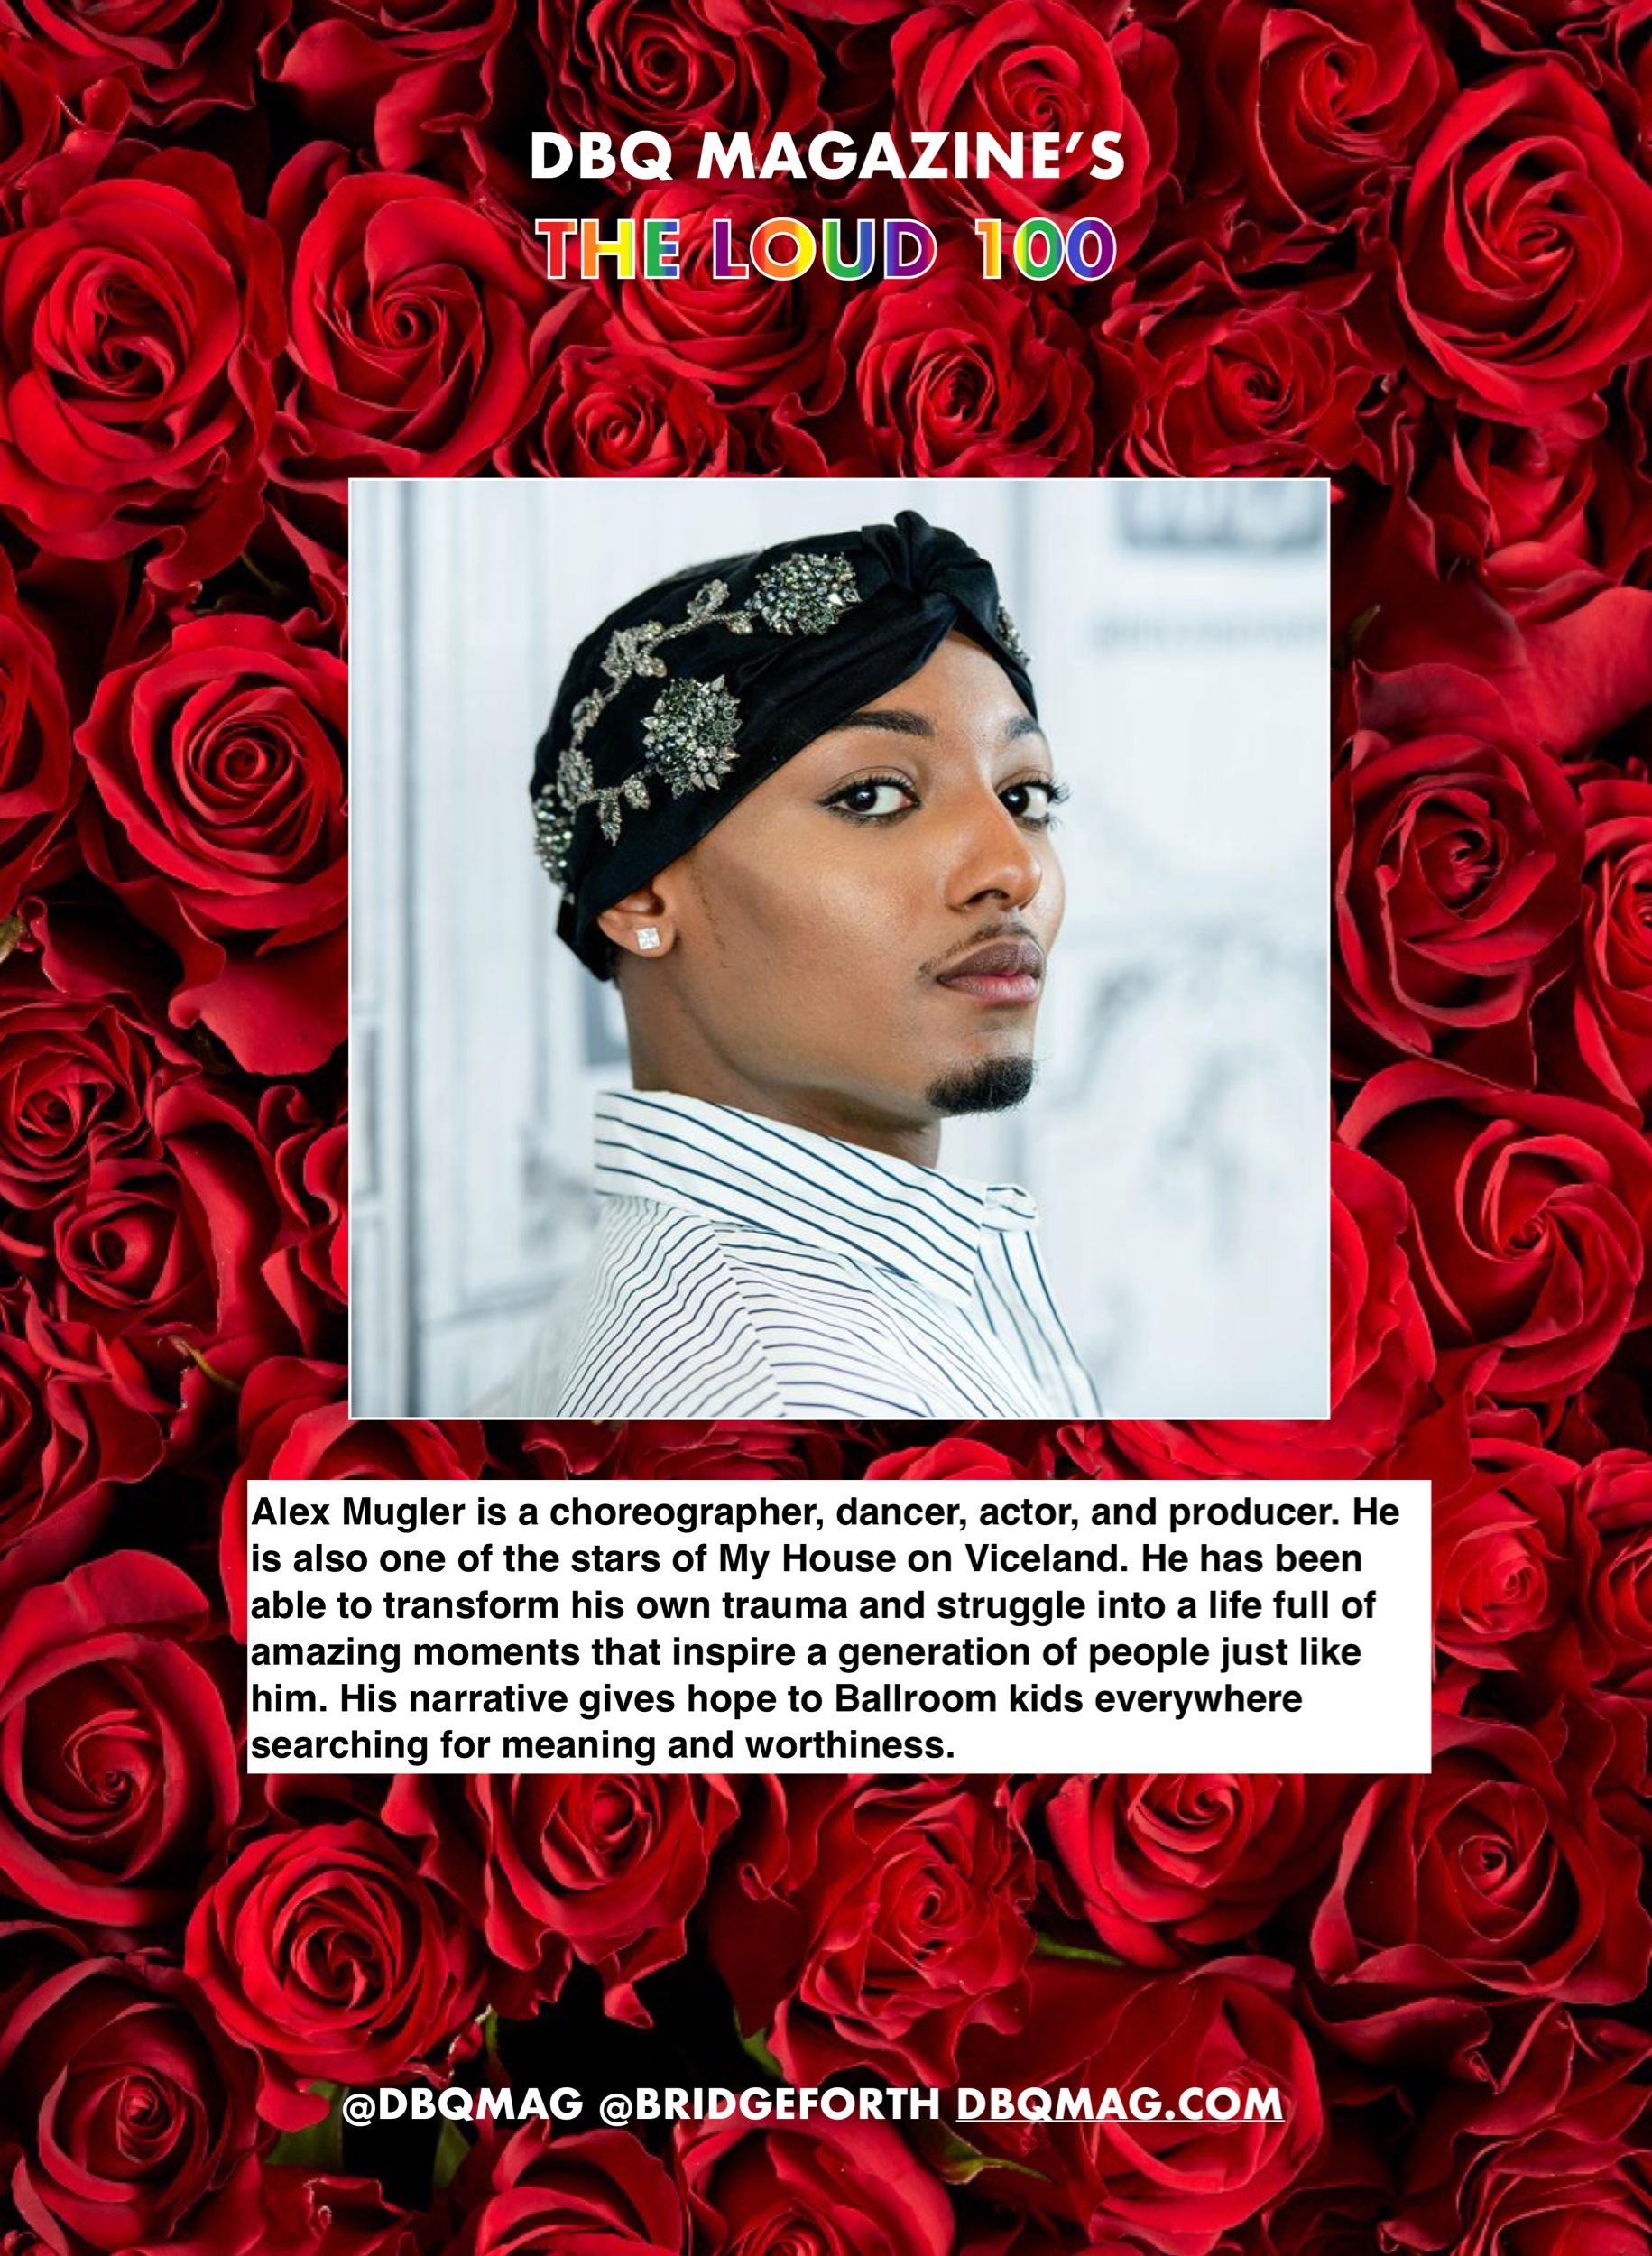 DBQ Magazine Summer 19 - LOUD 100-053.jpeg